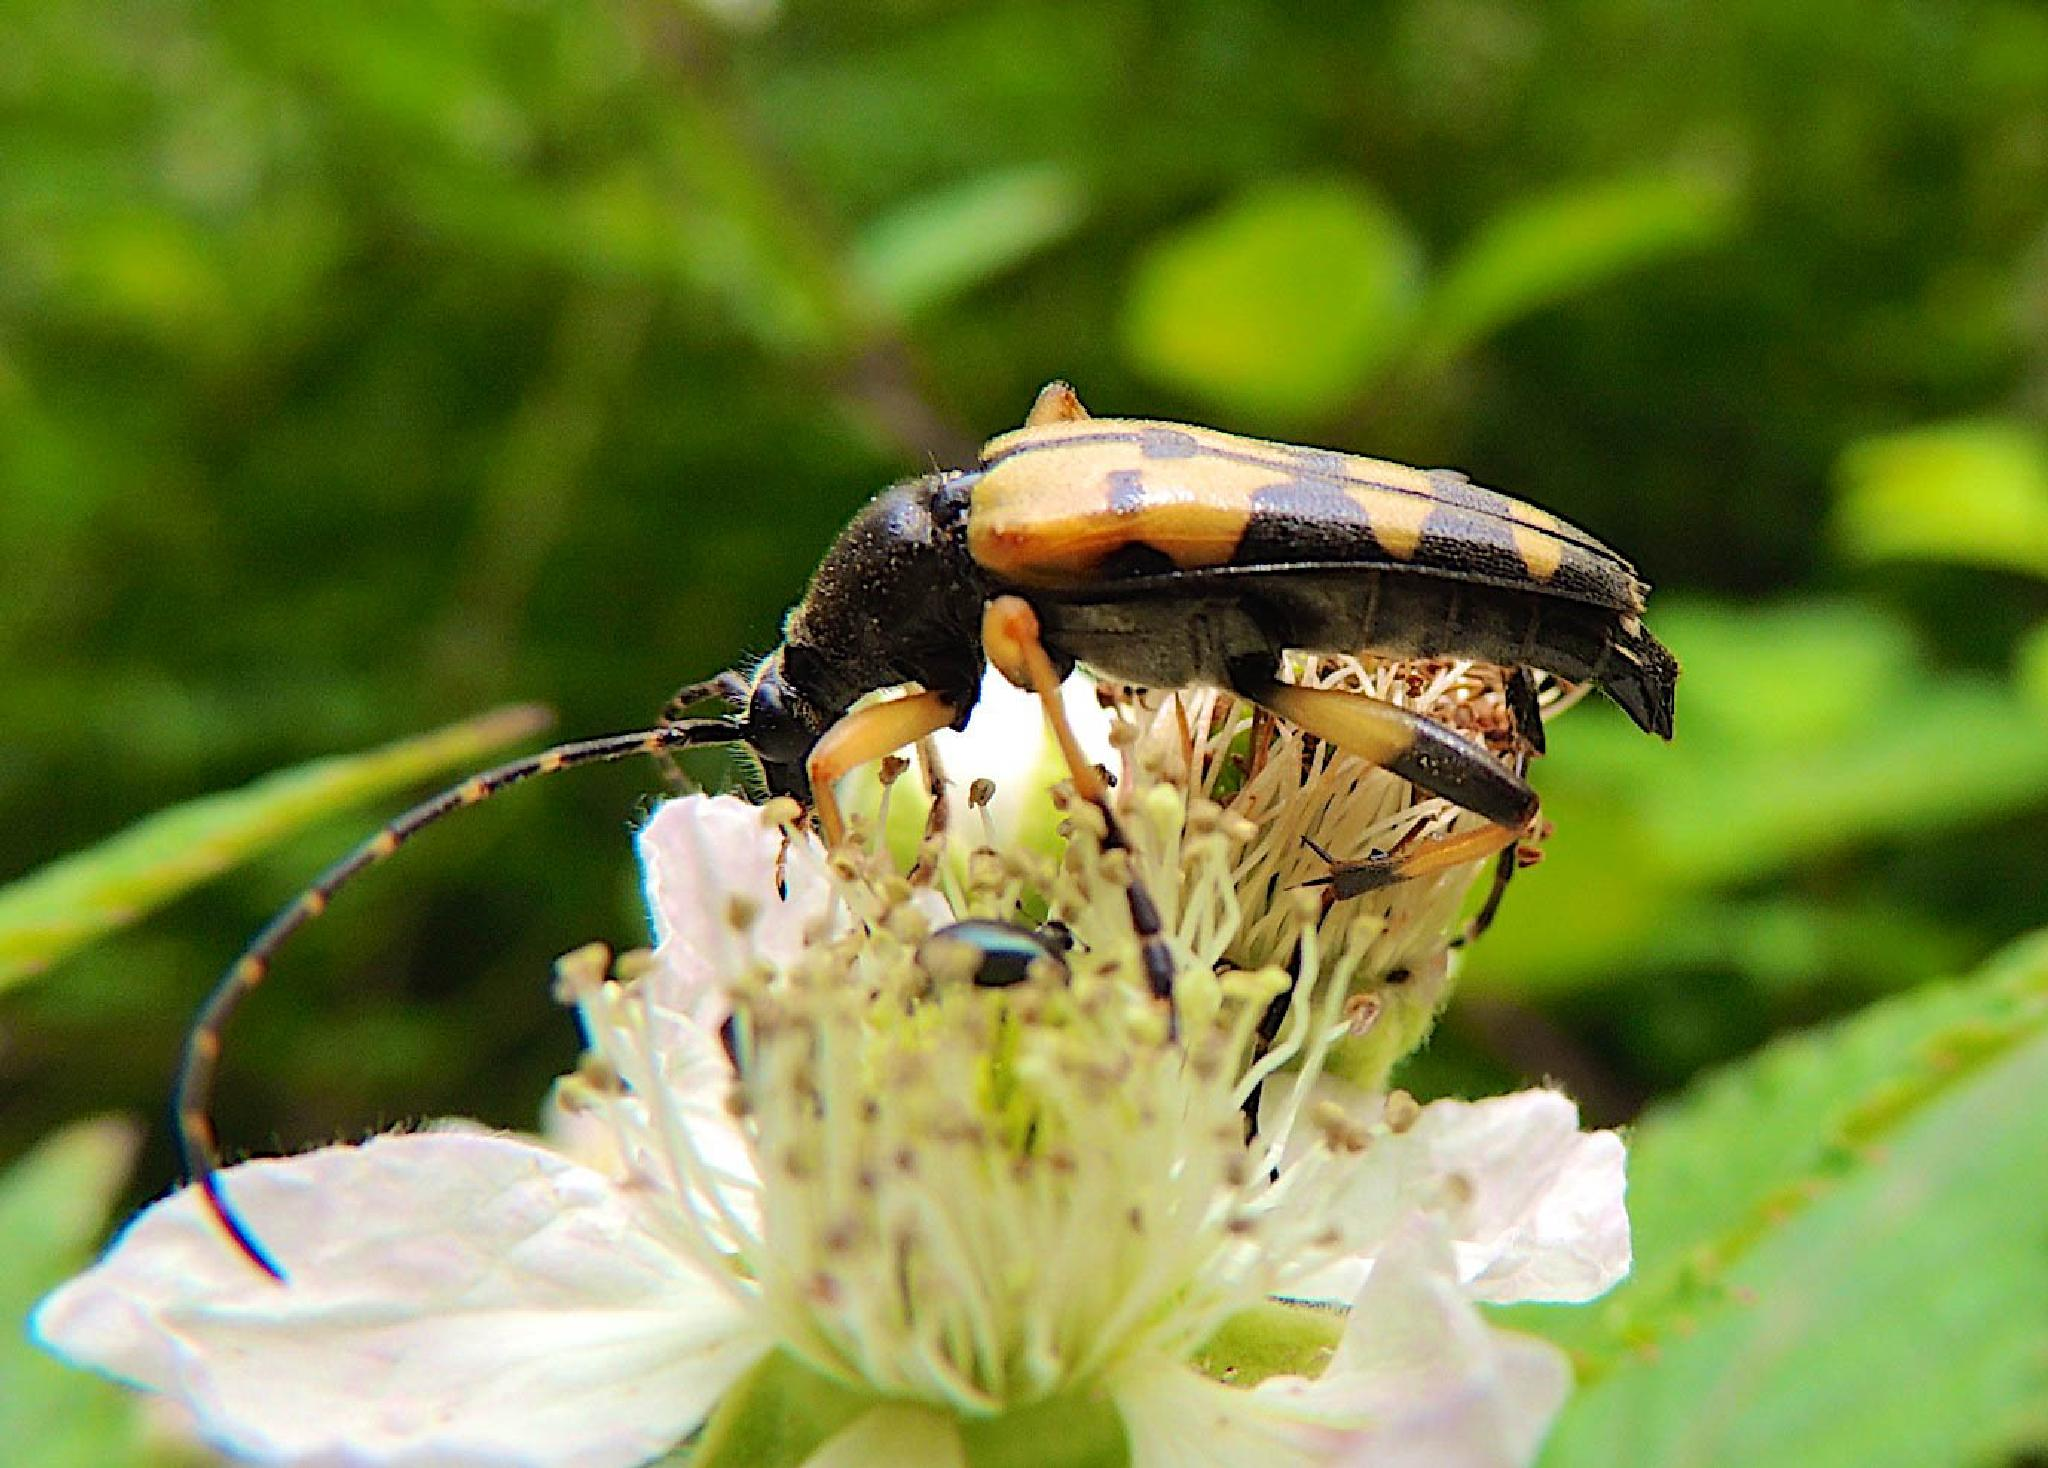 Bug by Oliver Kieser